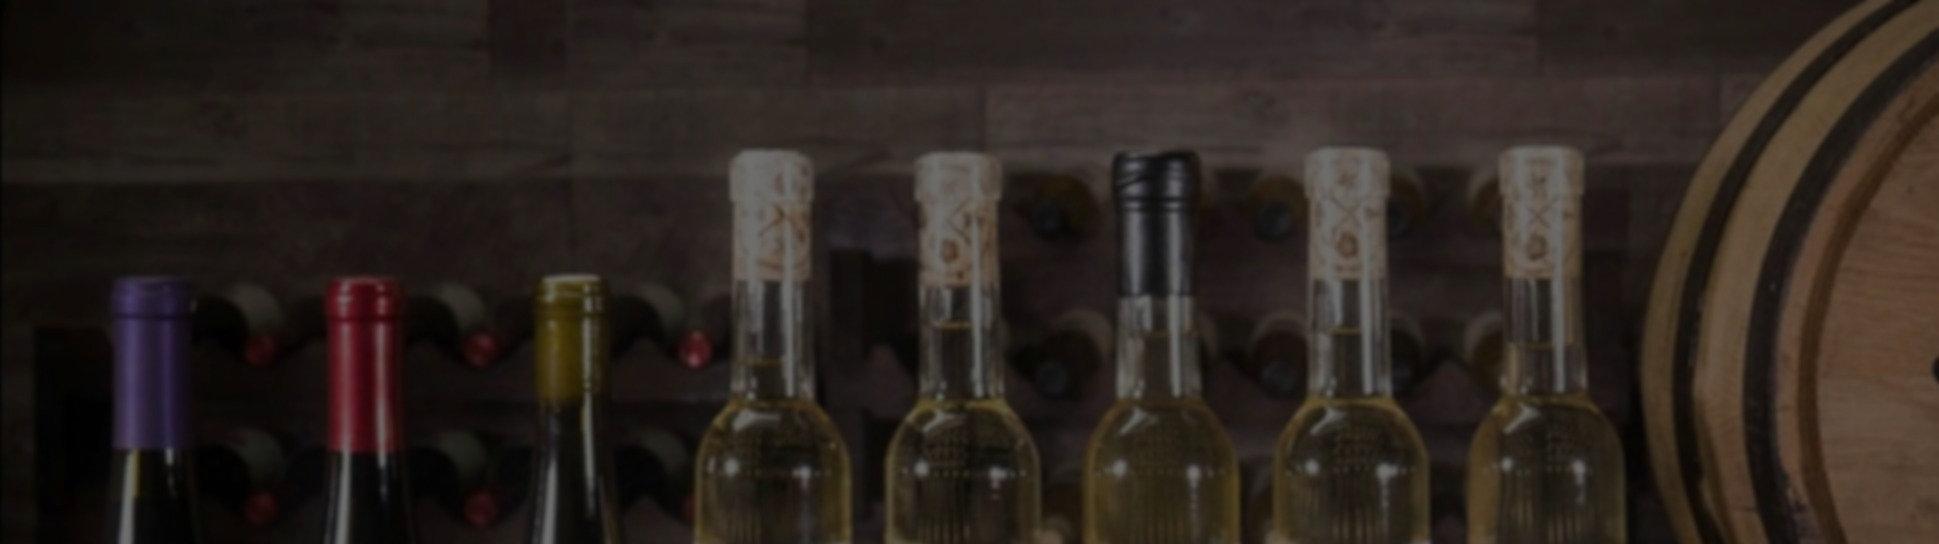 bottles-of-mead-banner-elgin-meadery_edi